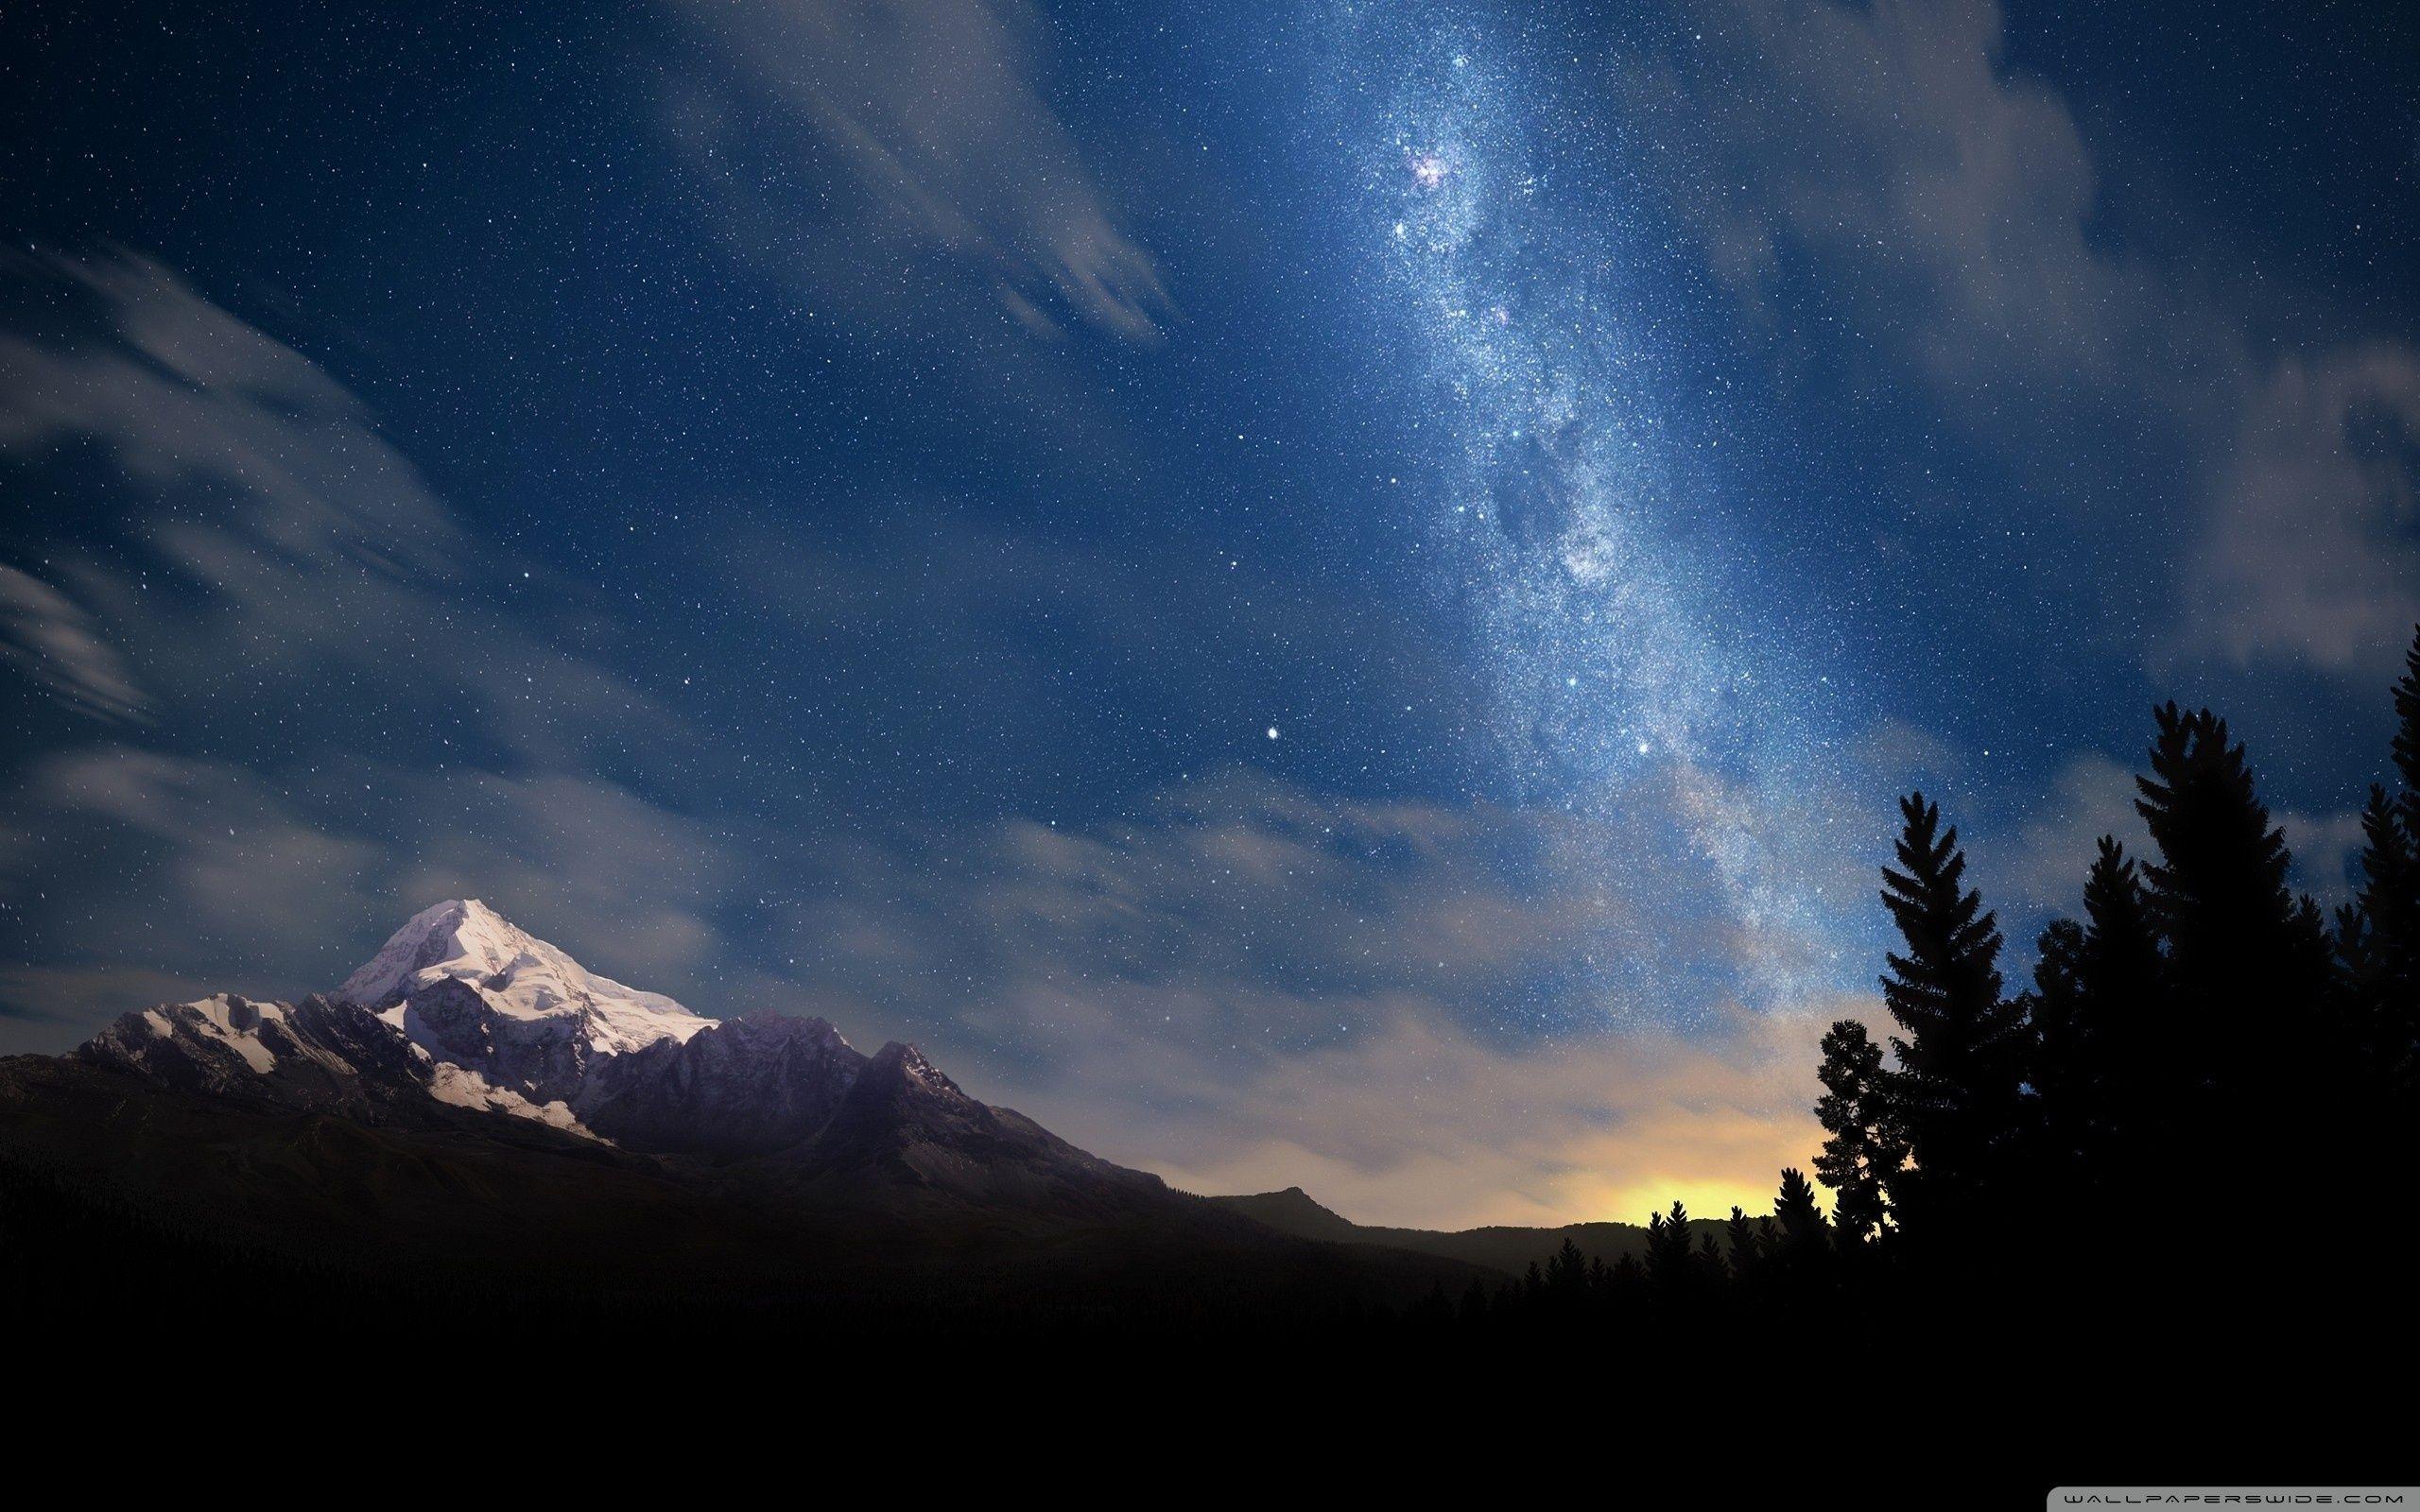 Starry Night Sky Hd Desktop Wallpaper High Definition Night Sky Wallpaper Night Sky Hd Starry Night Sky Wallpaper